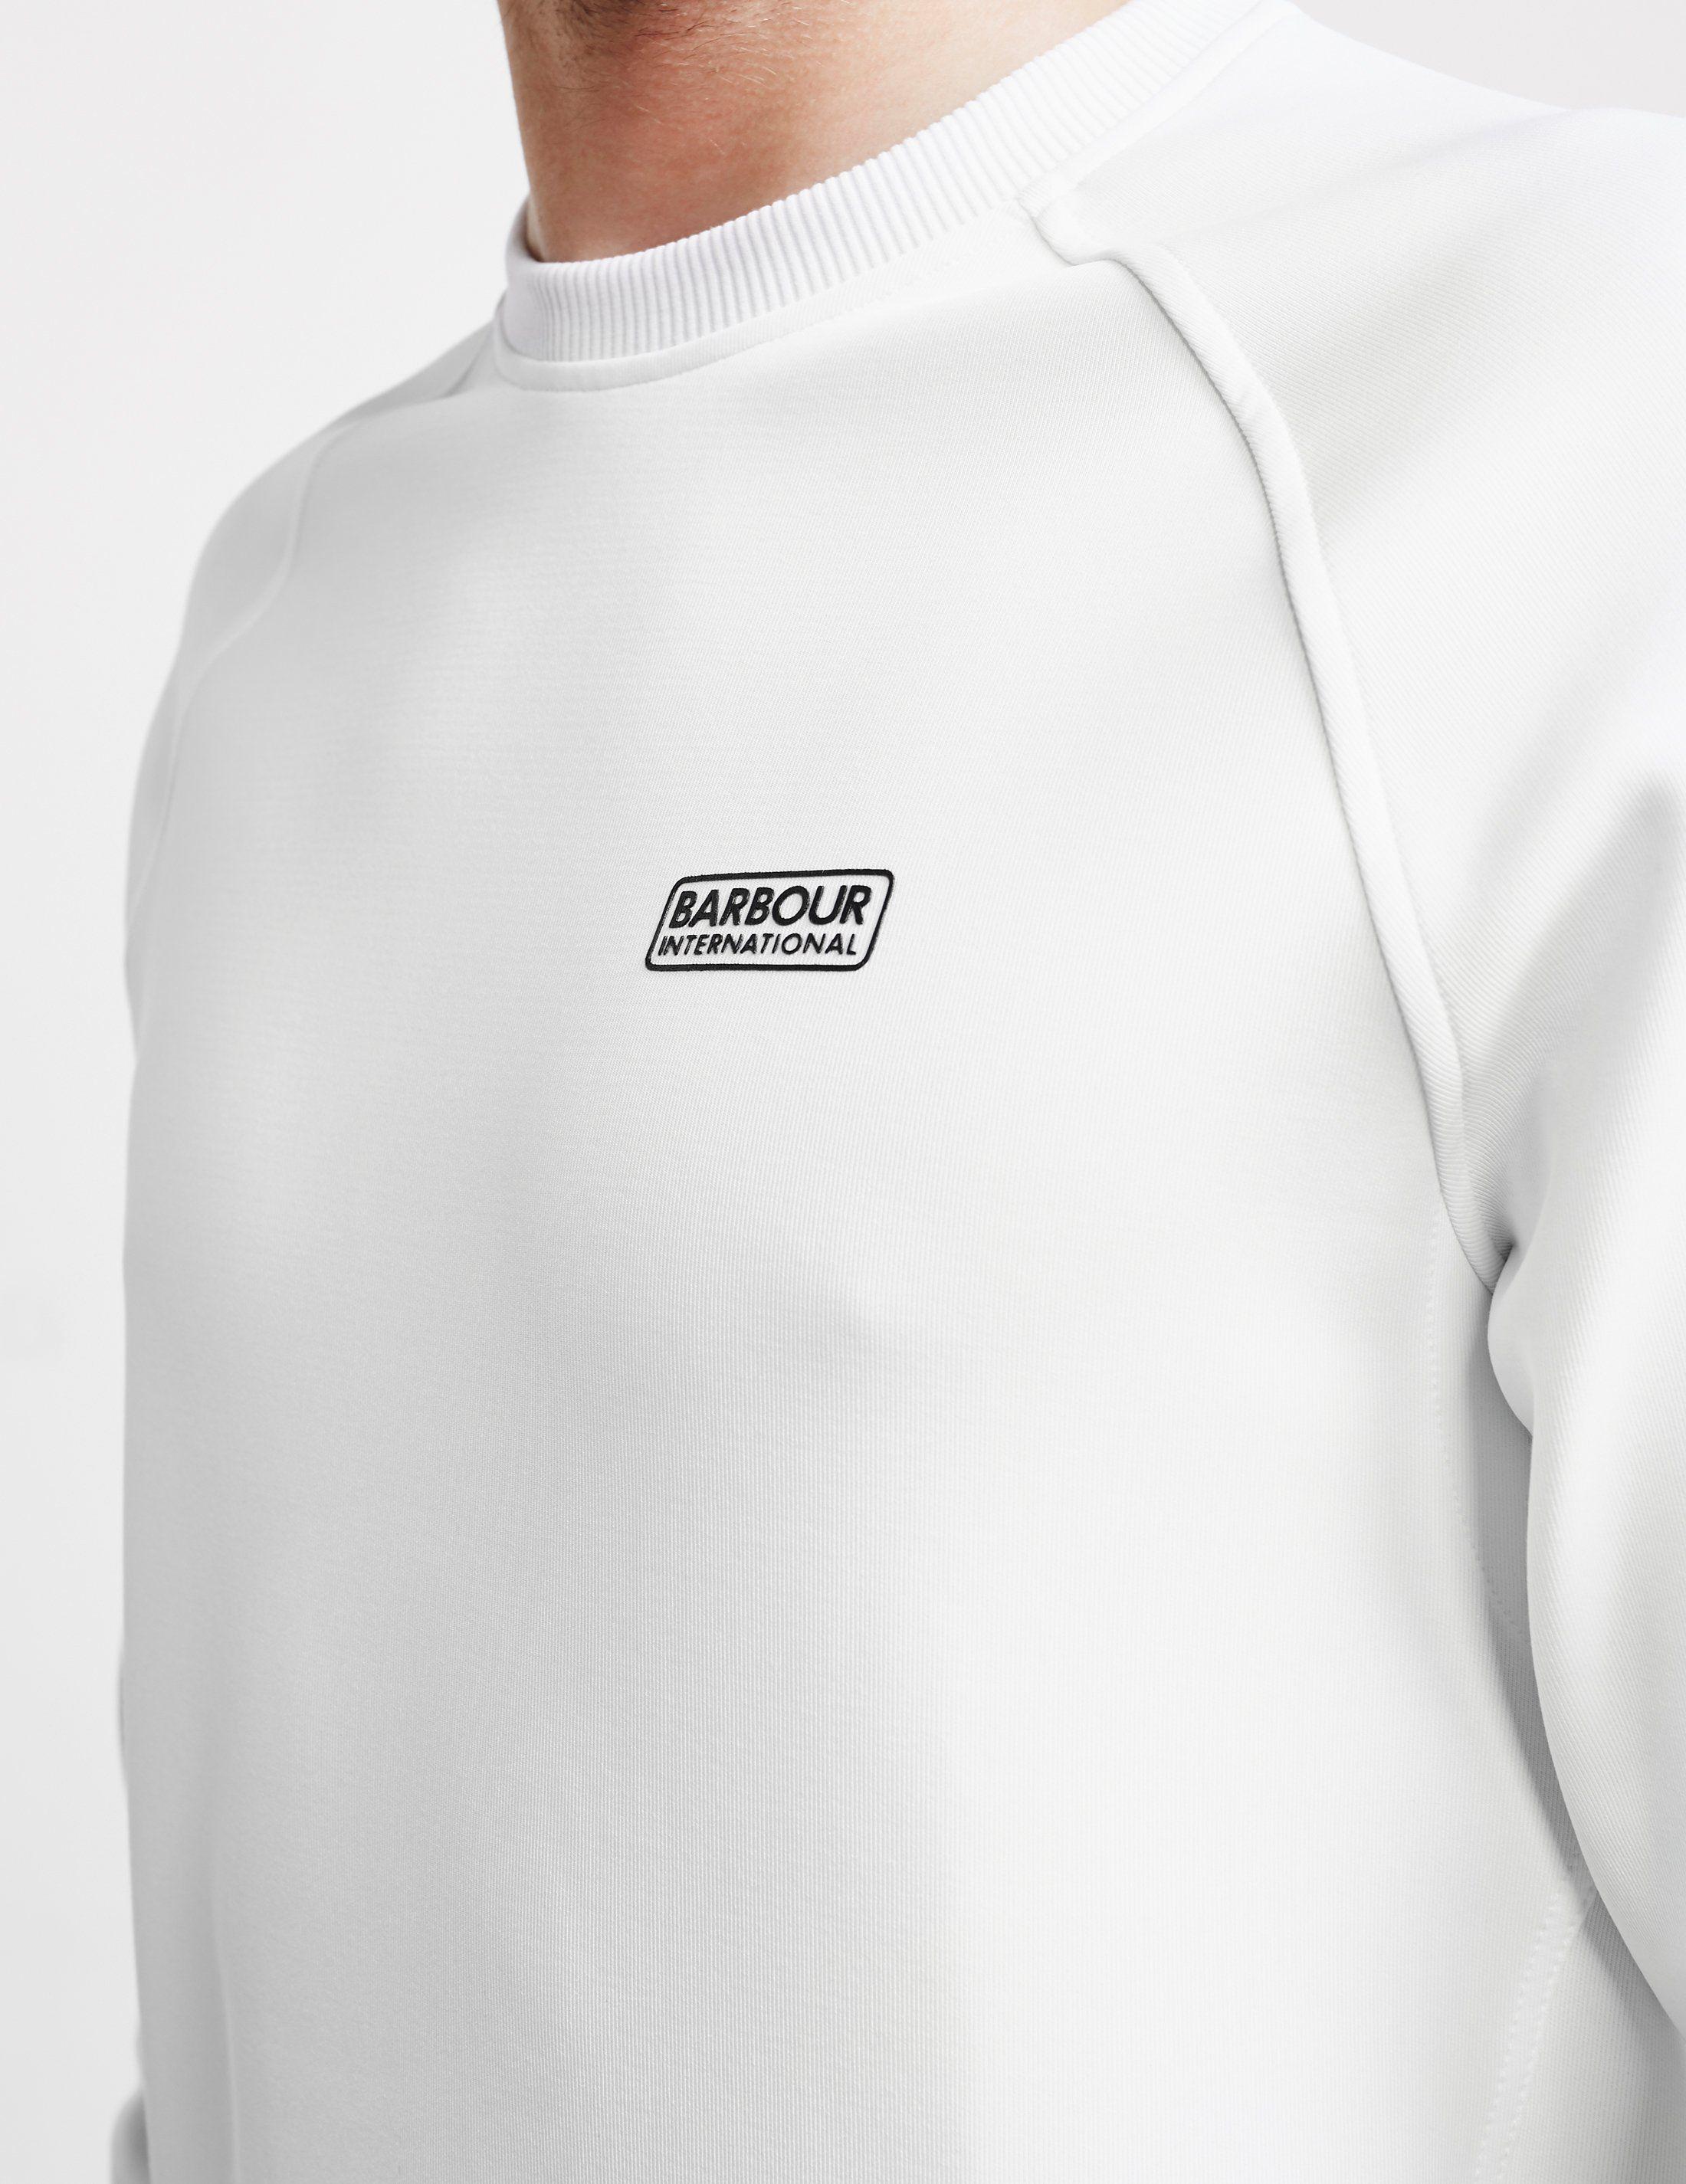 Barbour International Tech Sweatshirt